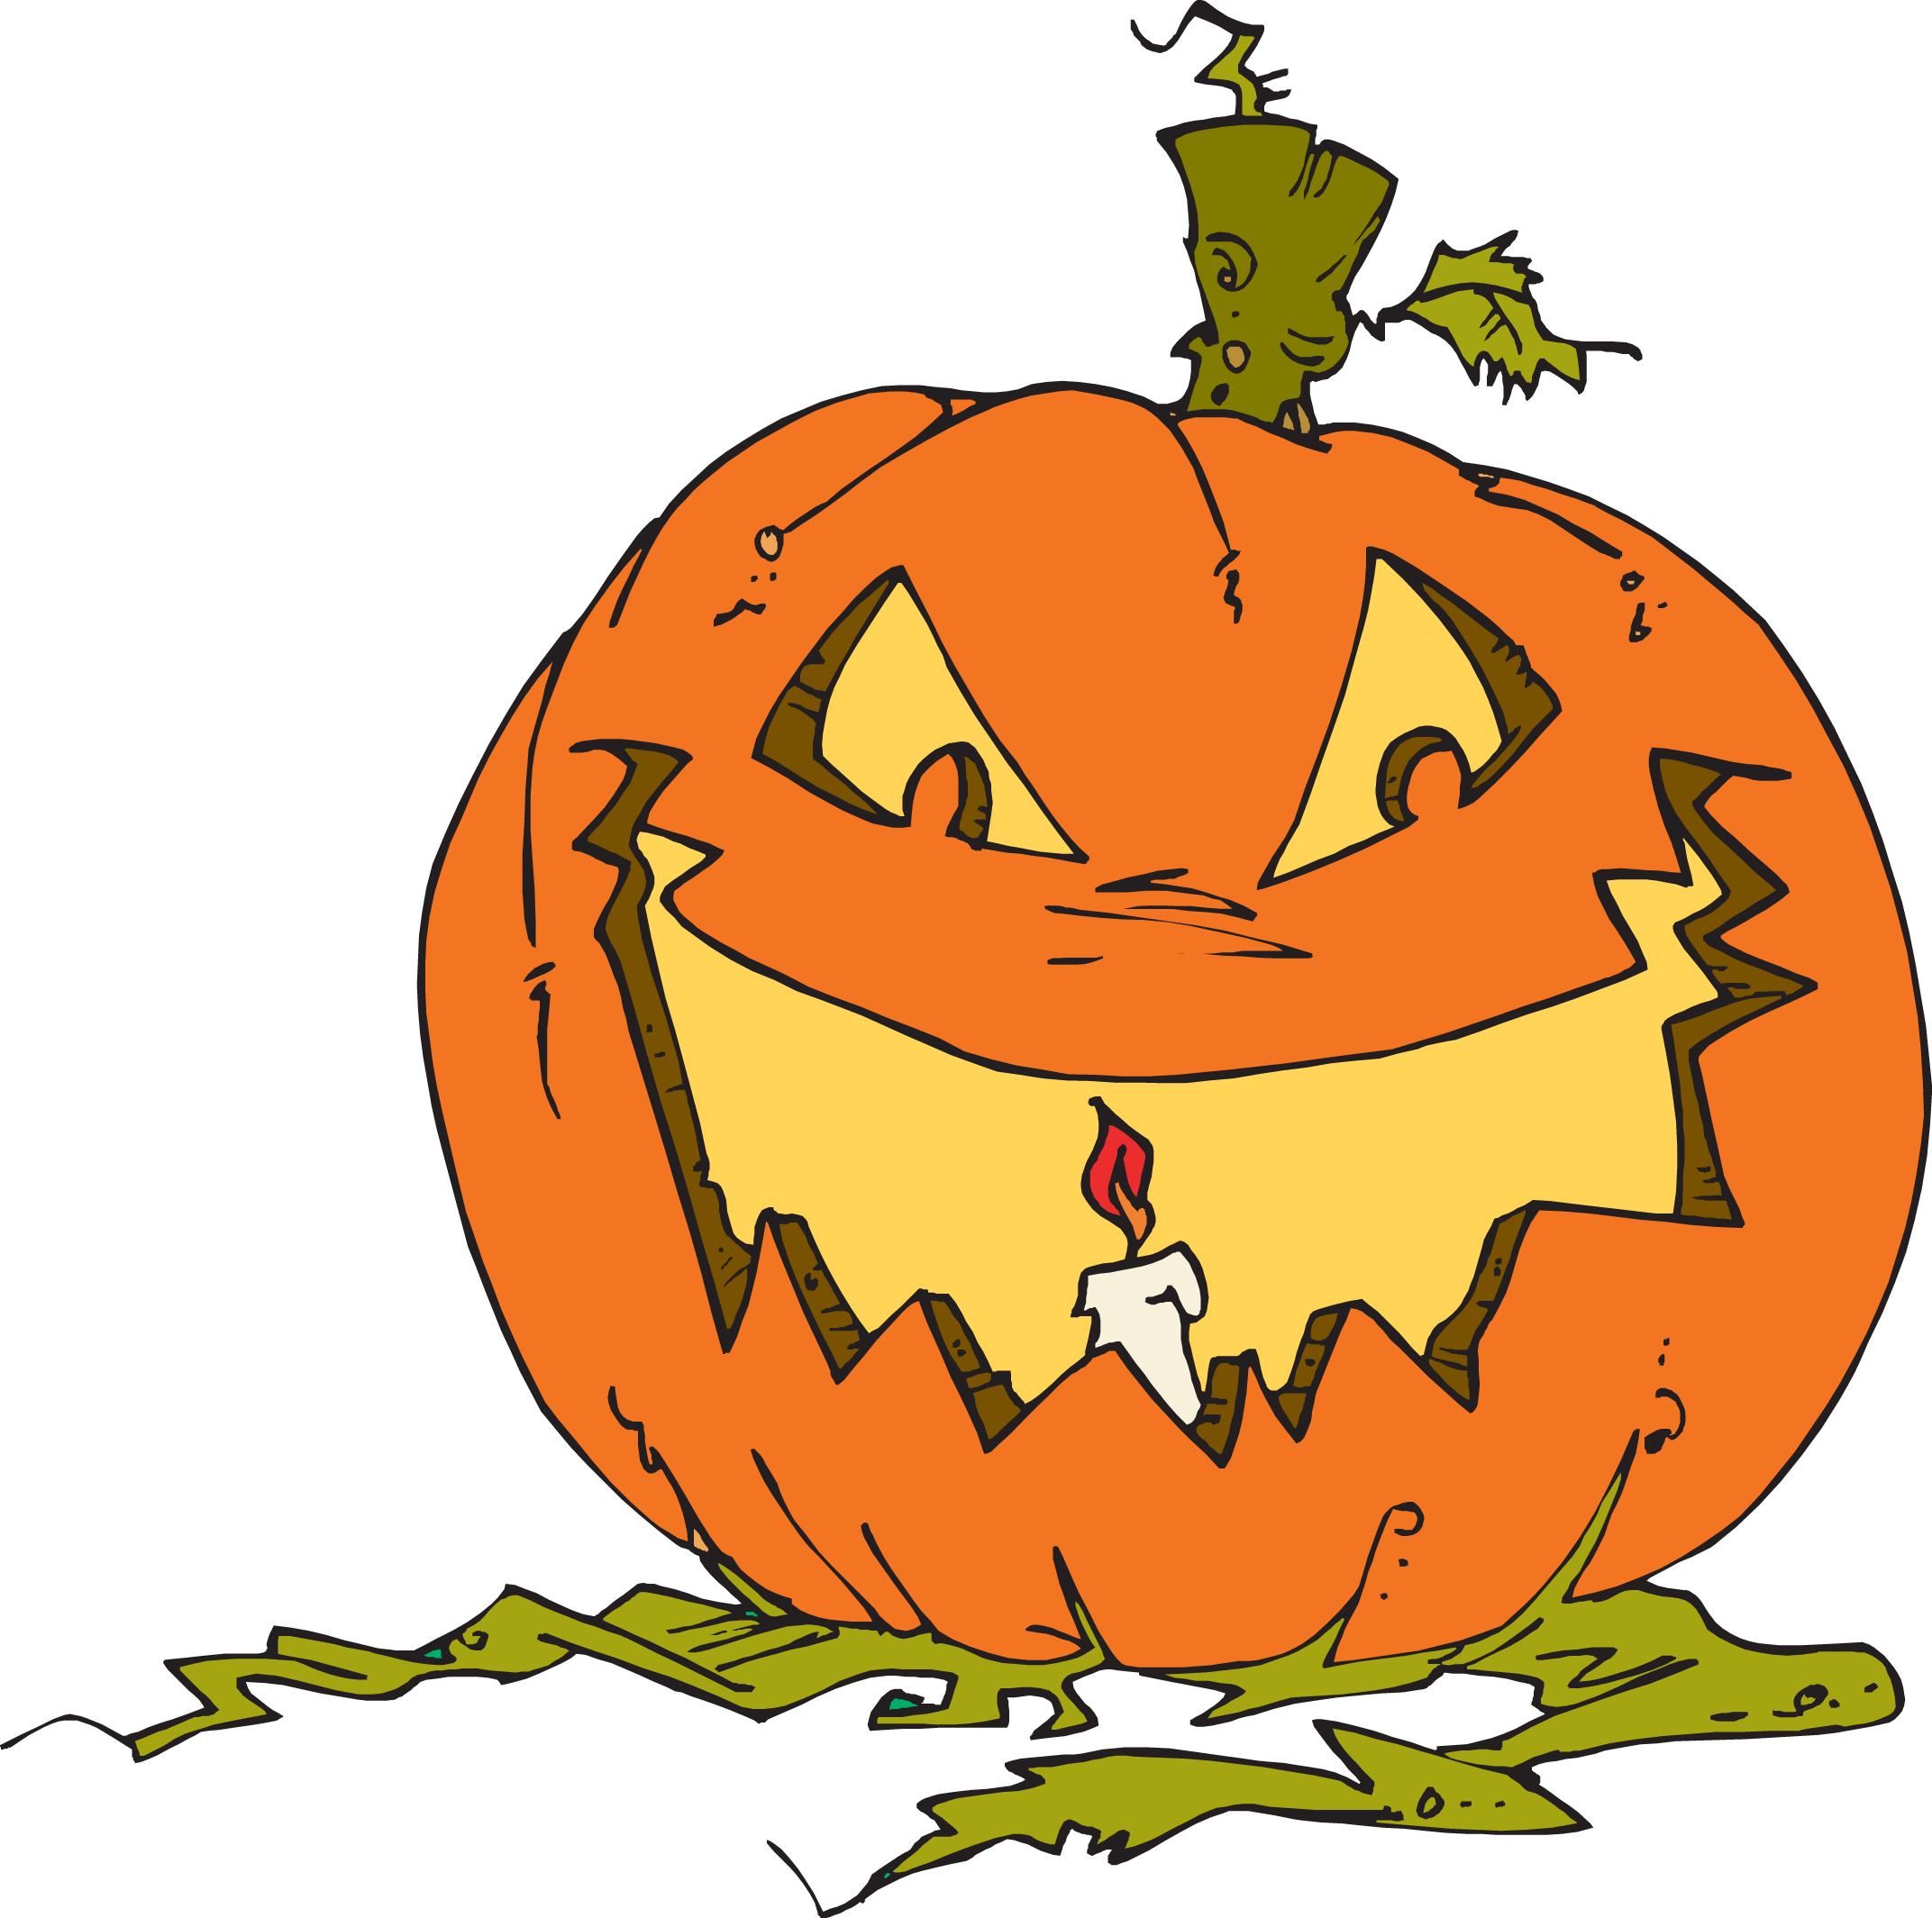 Jack-o'-lantern clipart #20, Download drawings